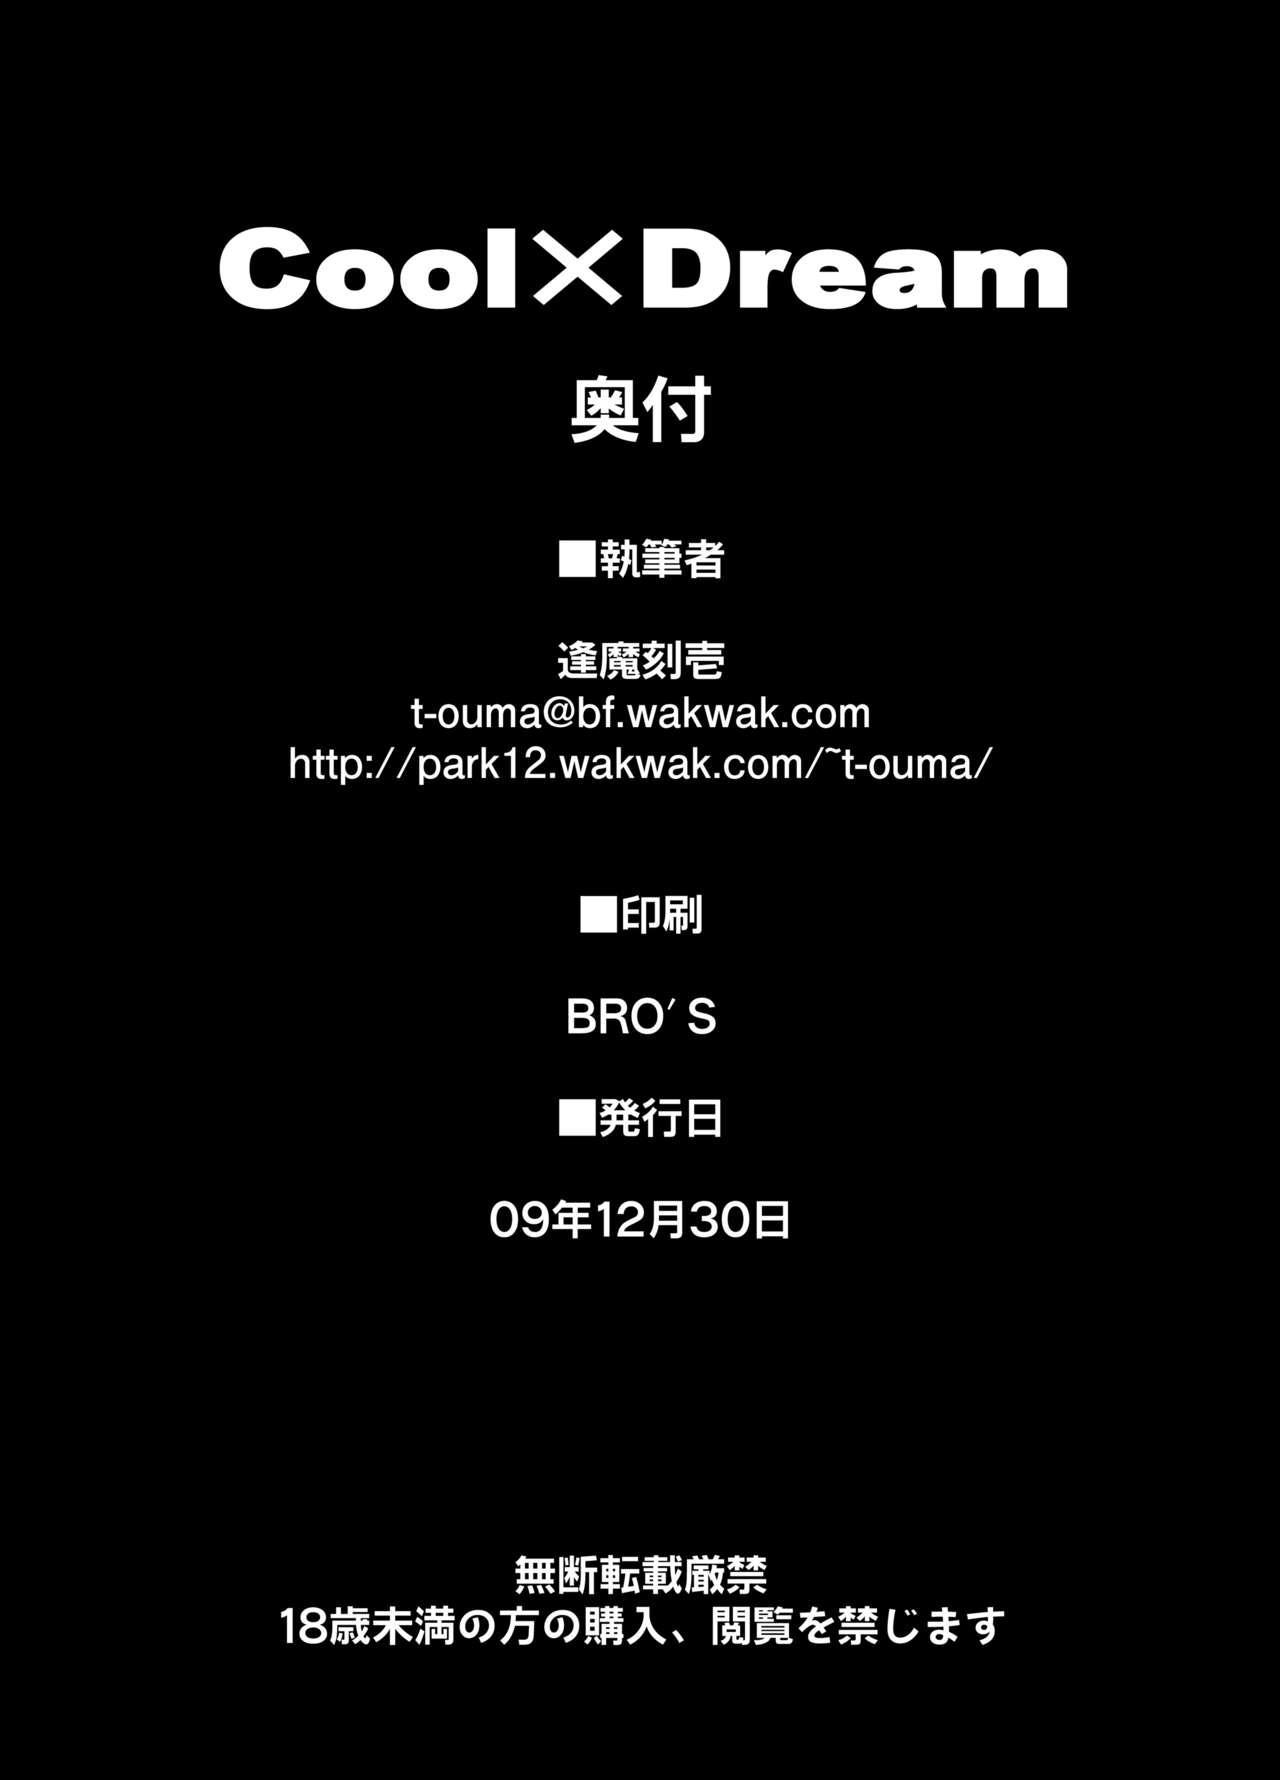 Cool×Dream 41